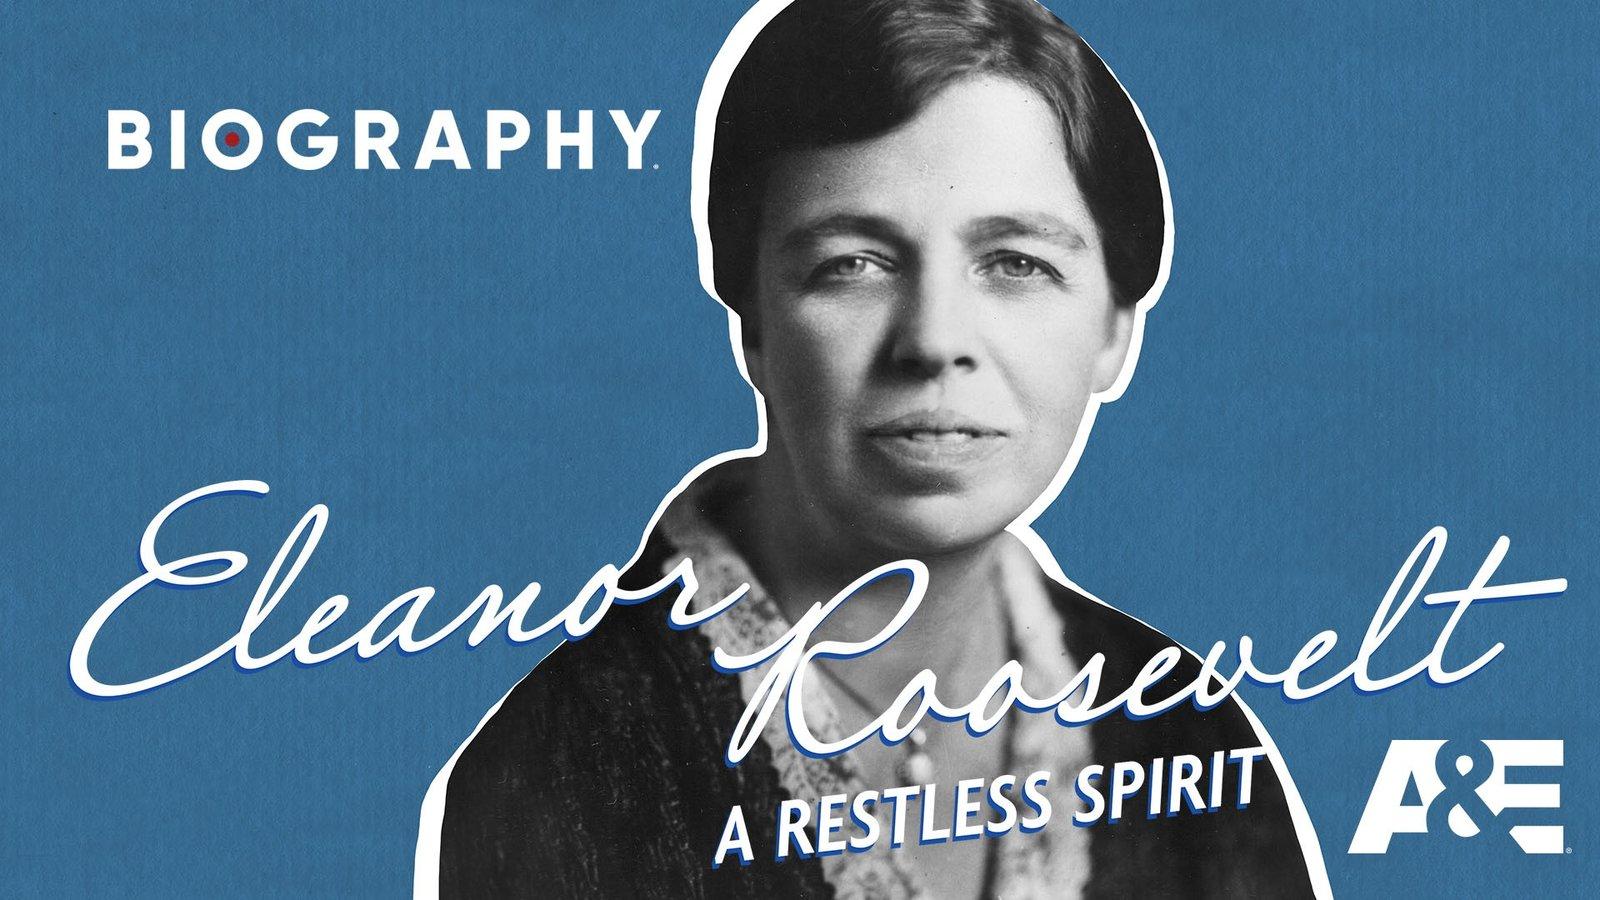 Eleanor Roosevelt: A Restless Spirit